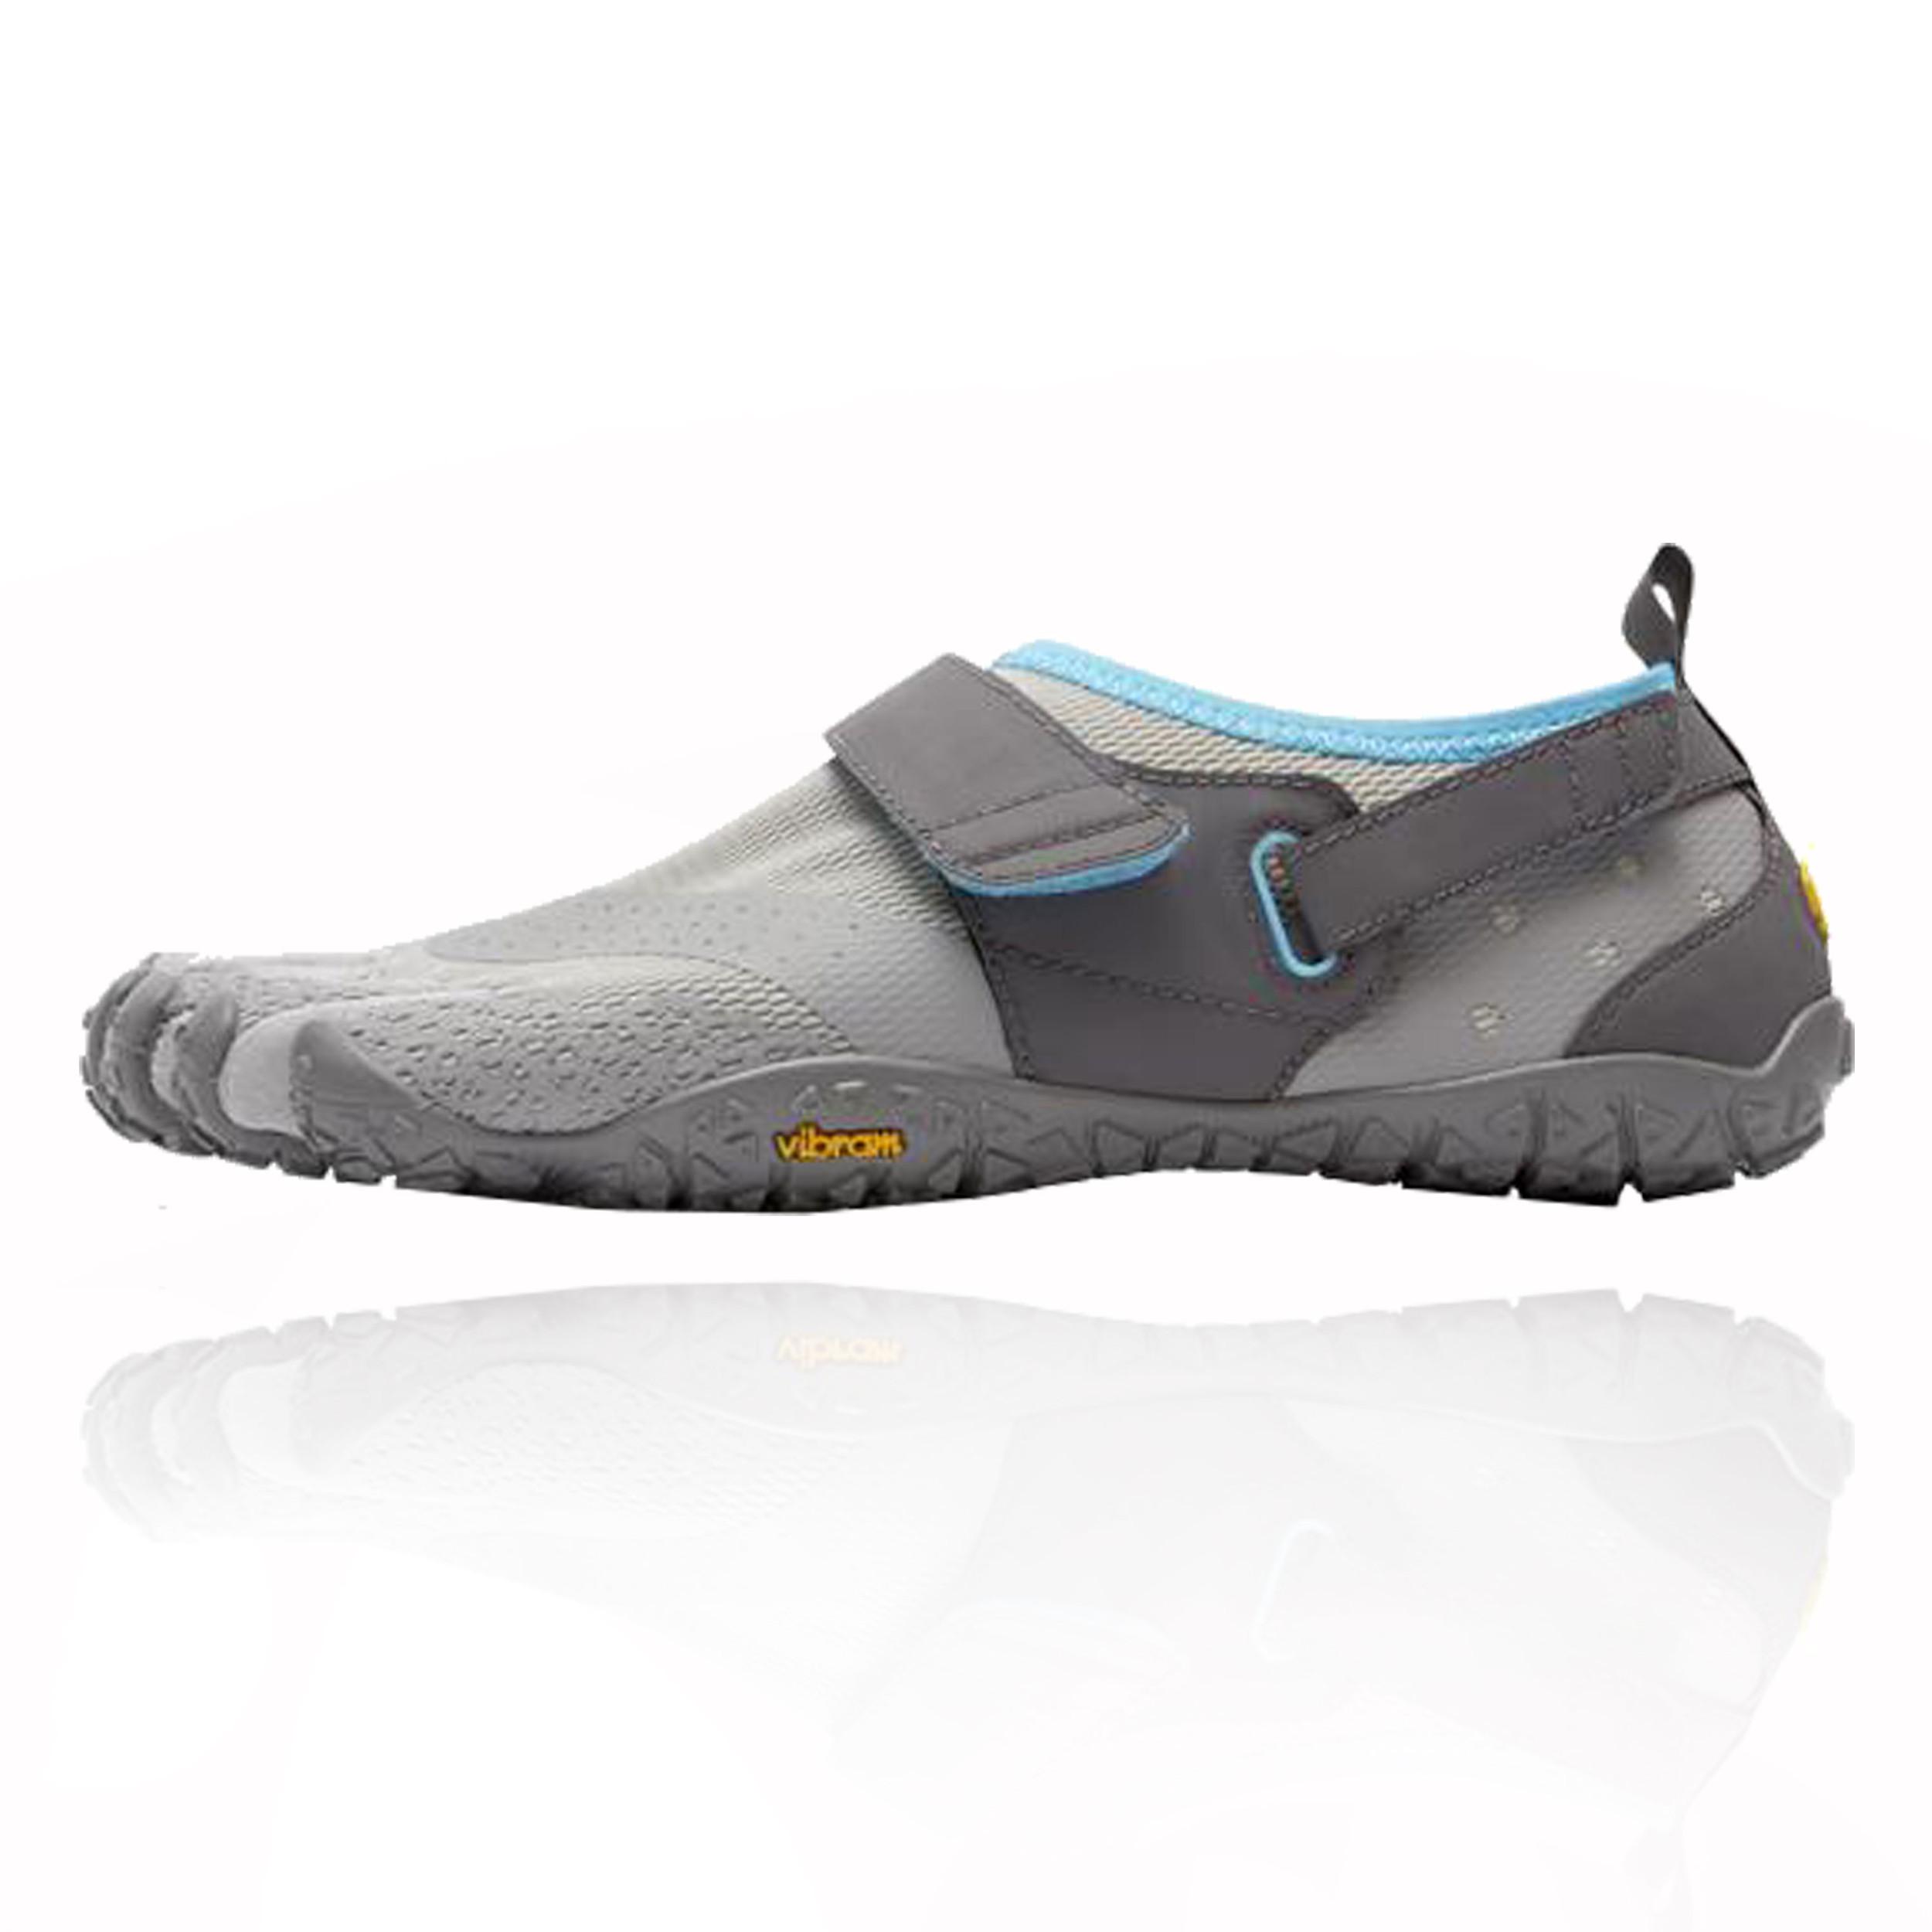 Zapatos grises con velcro Sugoi para hombre 0KX07m6i